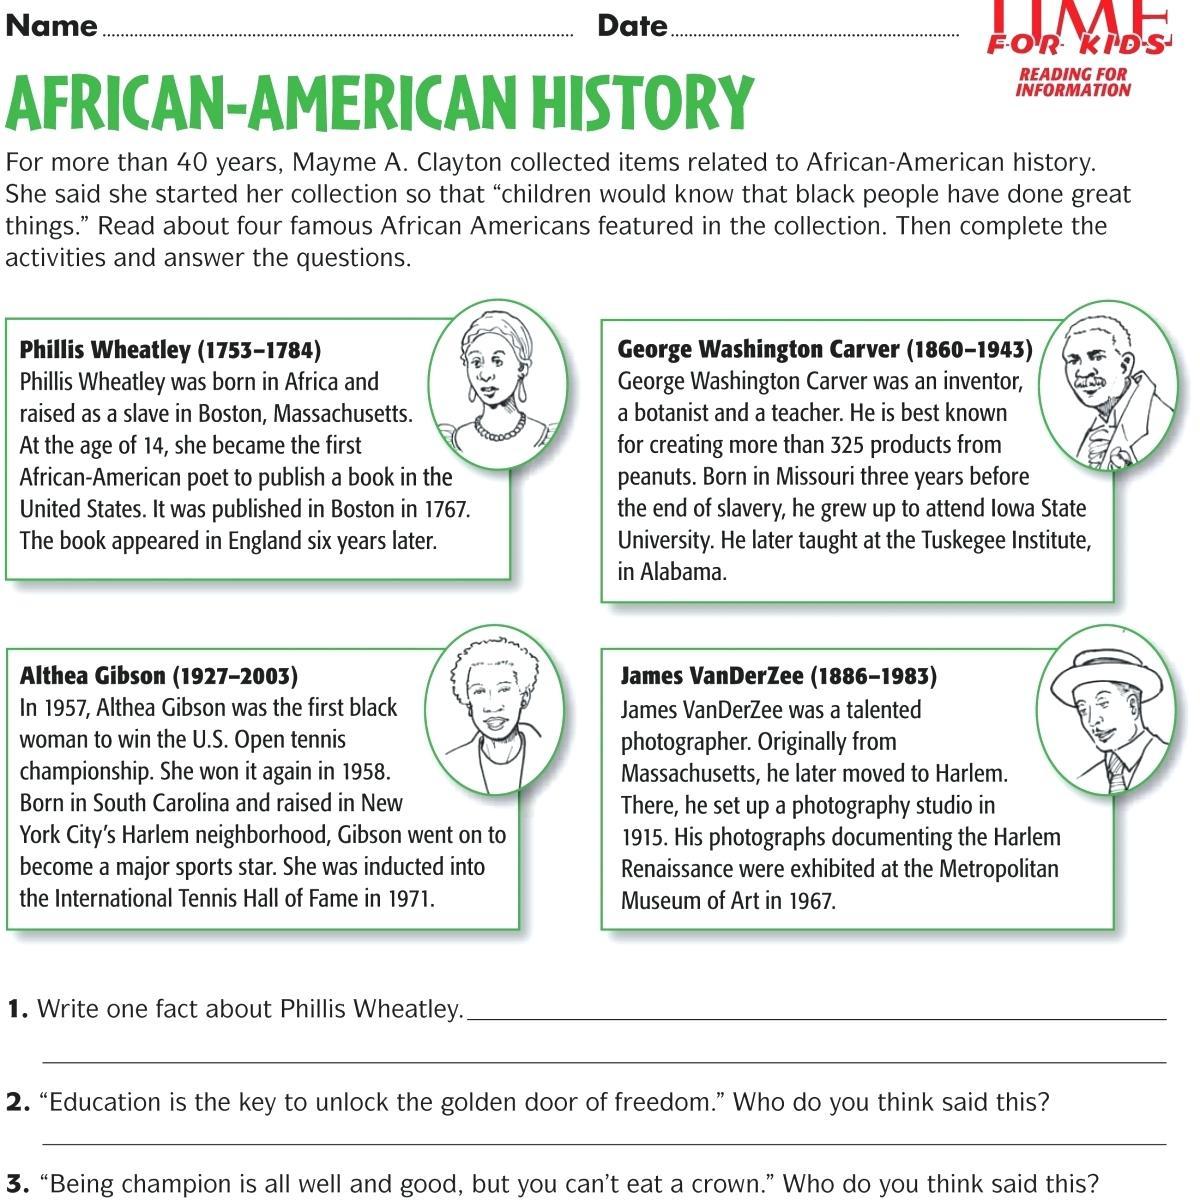 3Rd Grade Social Studies Worksheets For Download Free - Math - Free Printable Worksheets For 2Nd Grade Social Studies